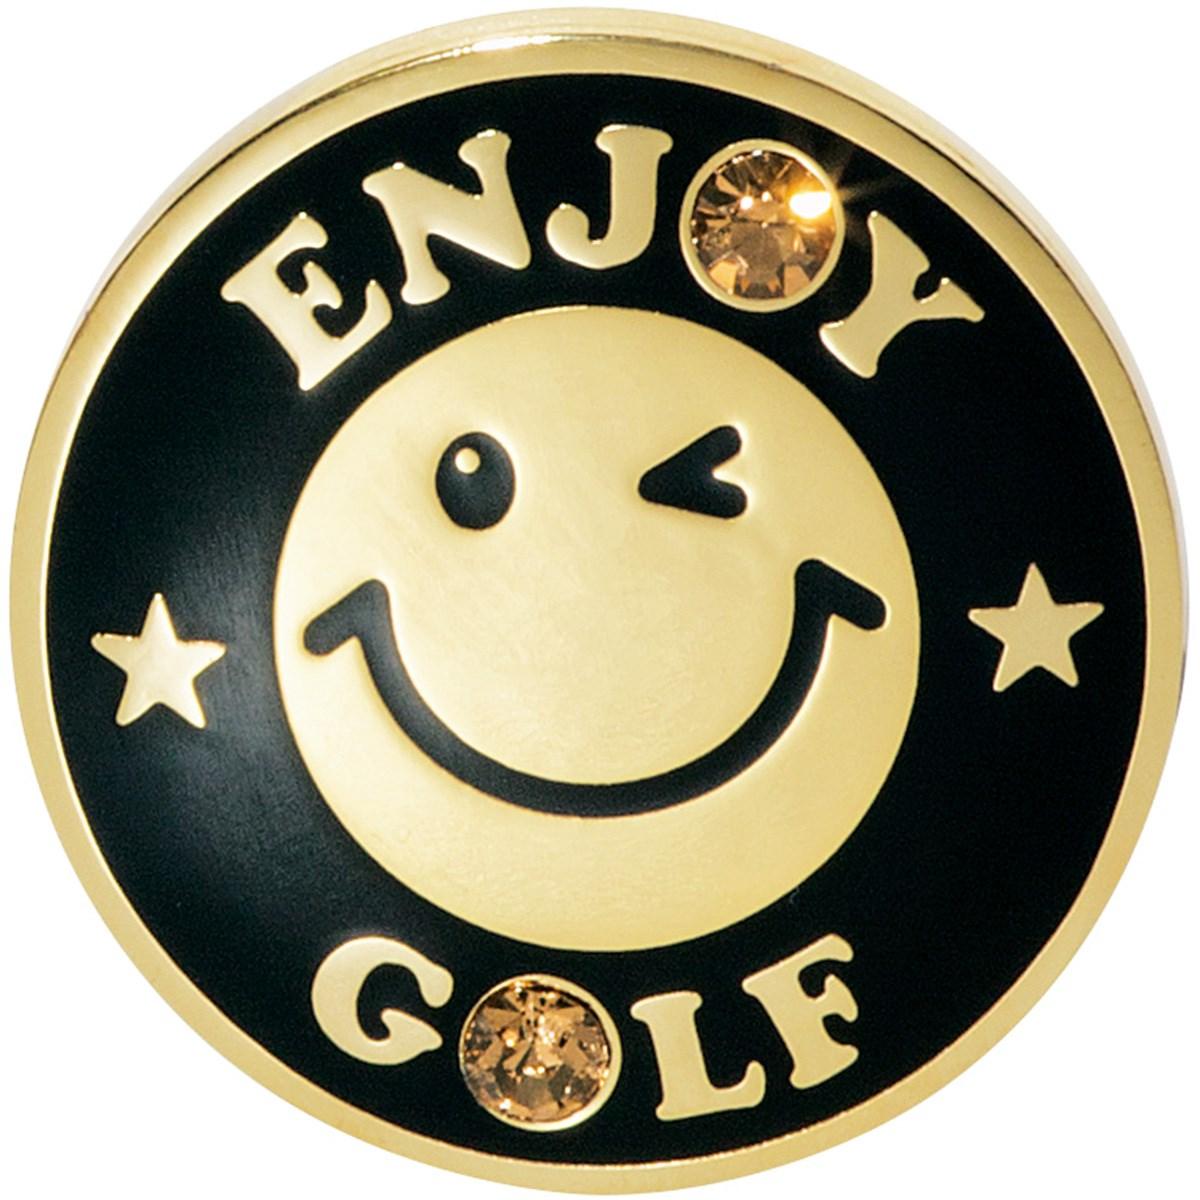 WINWIN STYLE ウィンウィンスタイル ENJOY GOLF Gold Ver. マーカー ブラック